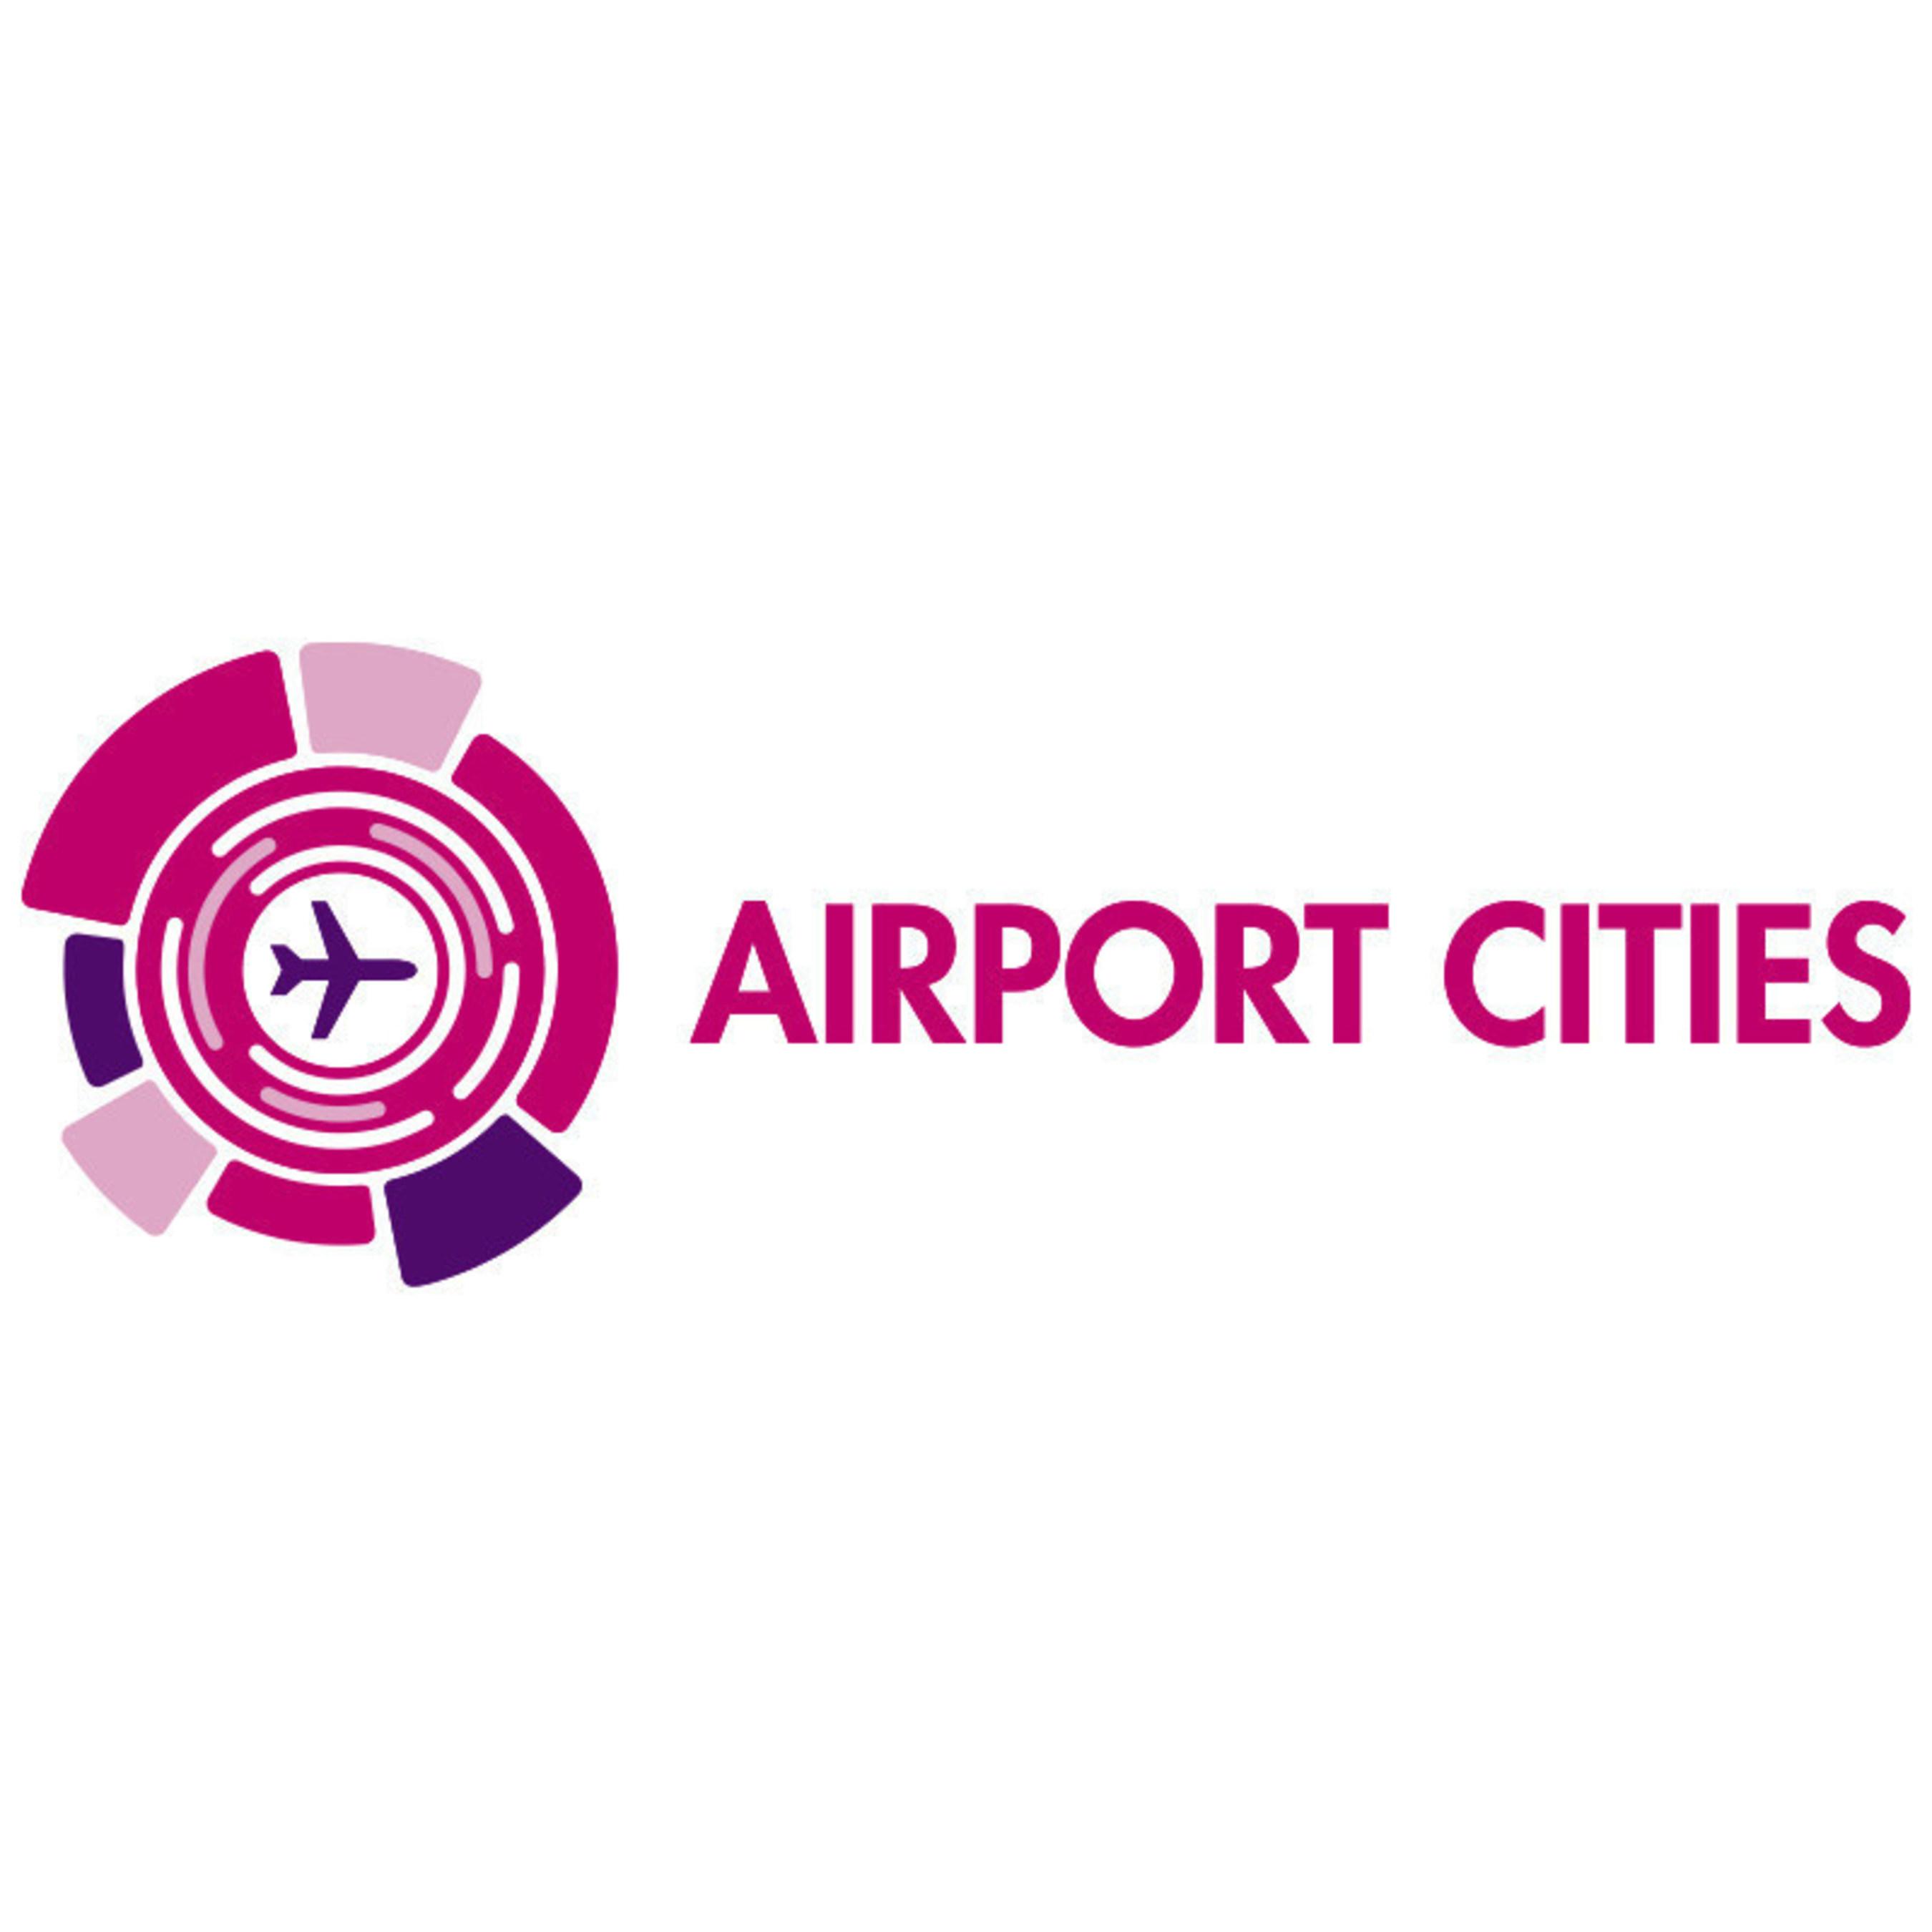 Airport Cities Logo